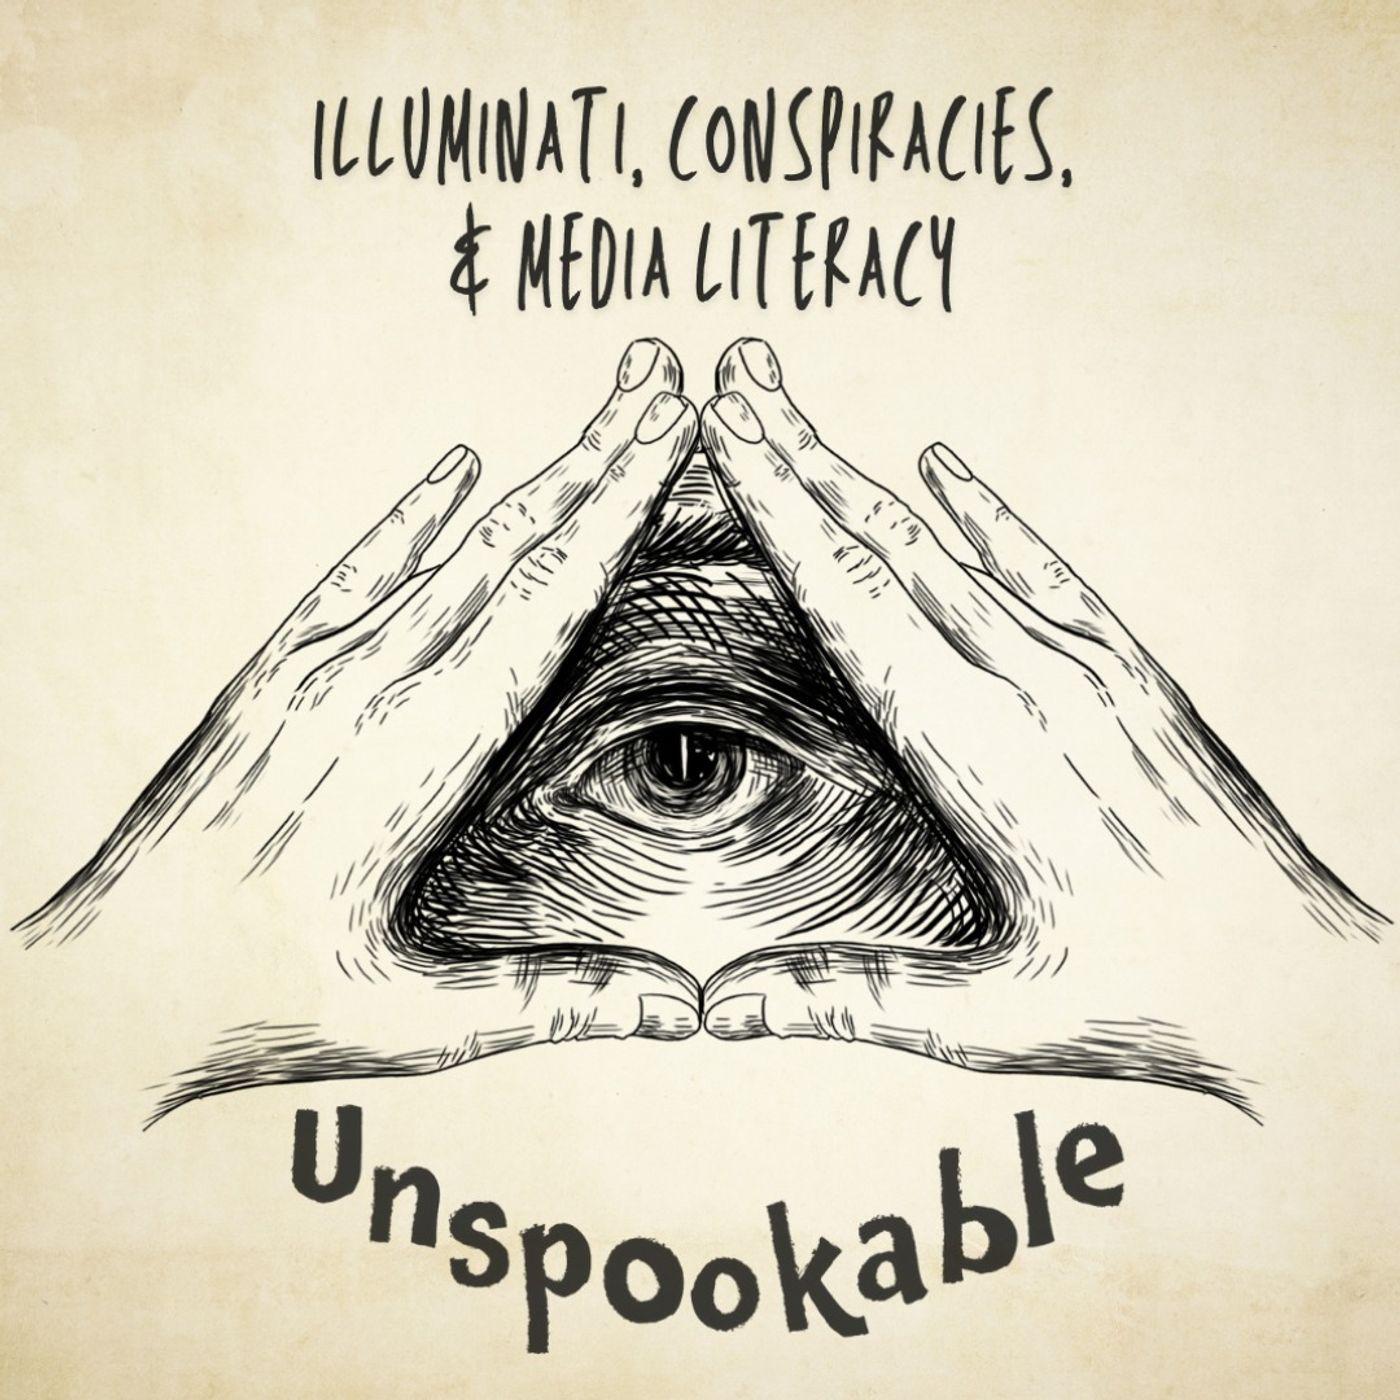 Episode 27: Illuminati, Conspiracies, & Media Literacy